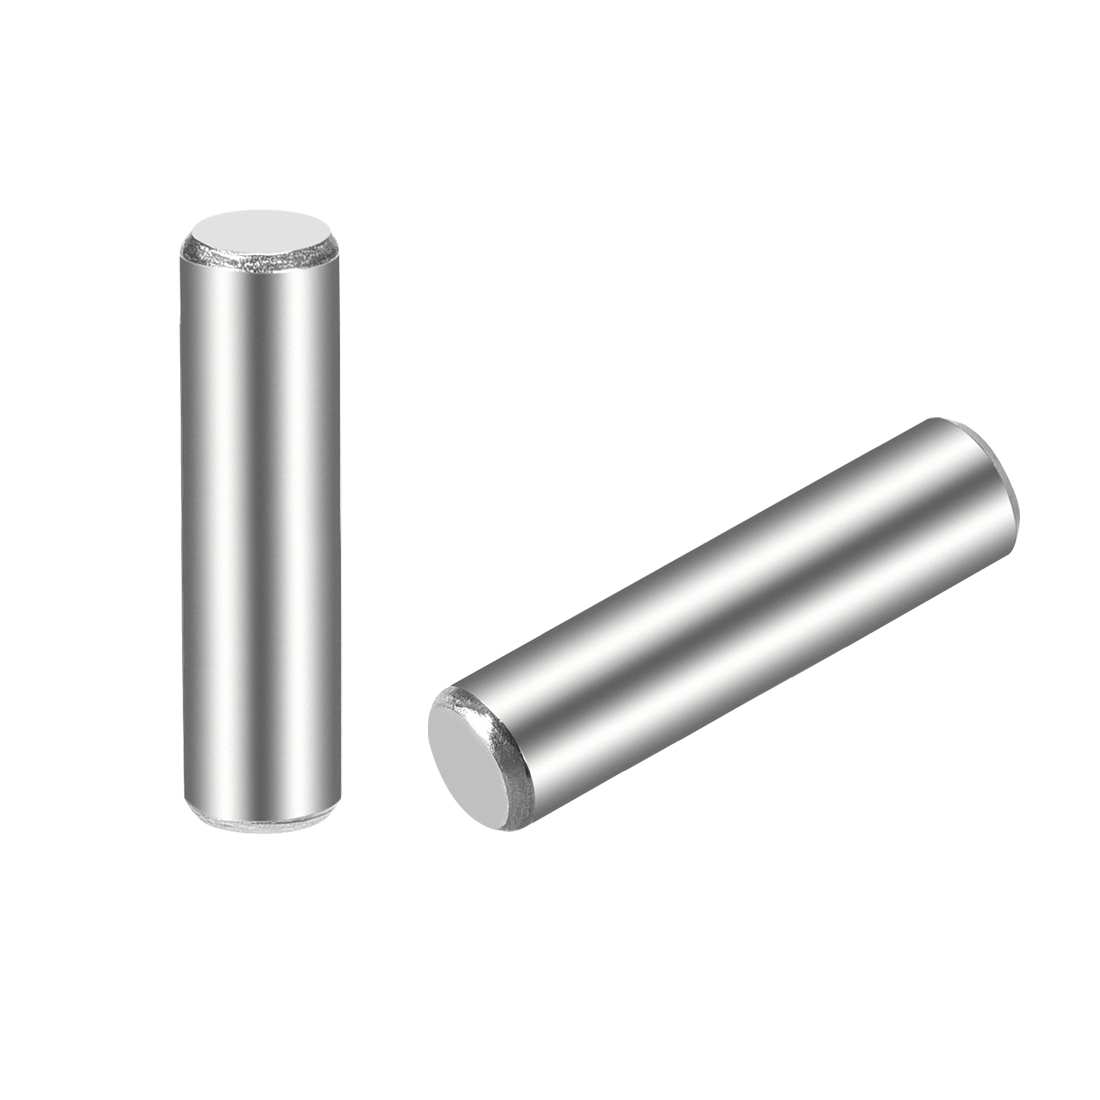 25Pcs 5mm x 20mm Dowel Pin 304 Stainless Steel Shelf Support Pin Fasten